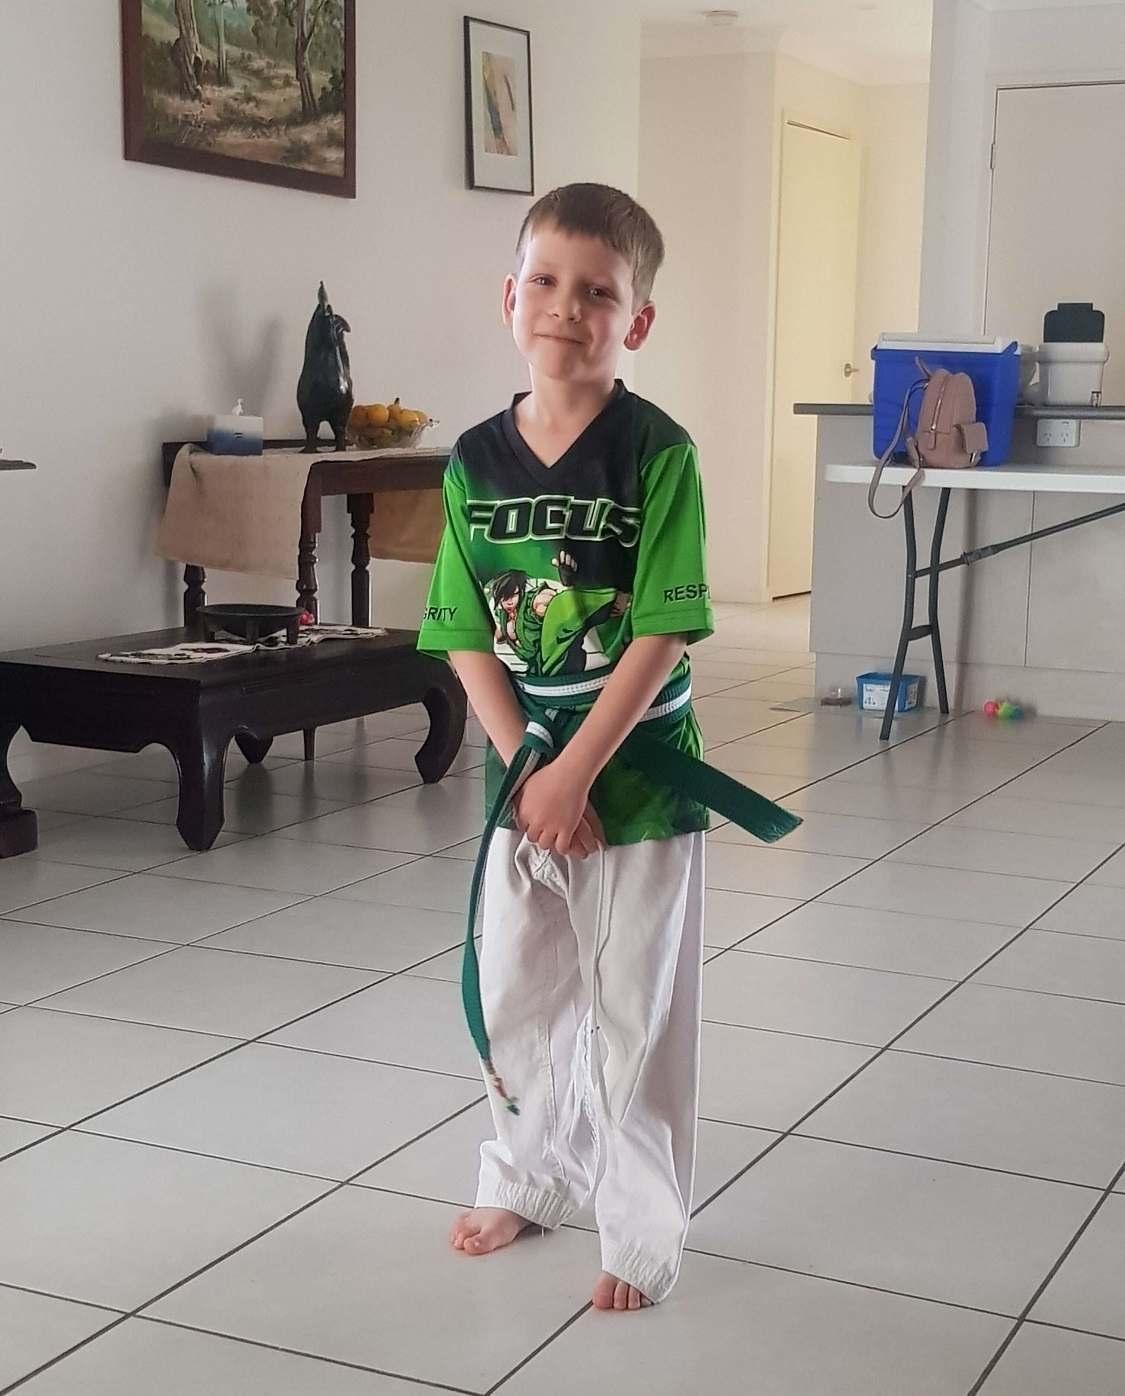 Webp.net Resizeimage 2, Focus Martial Arts Classes Brisbane, Queensland